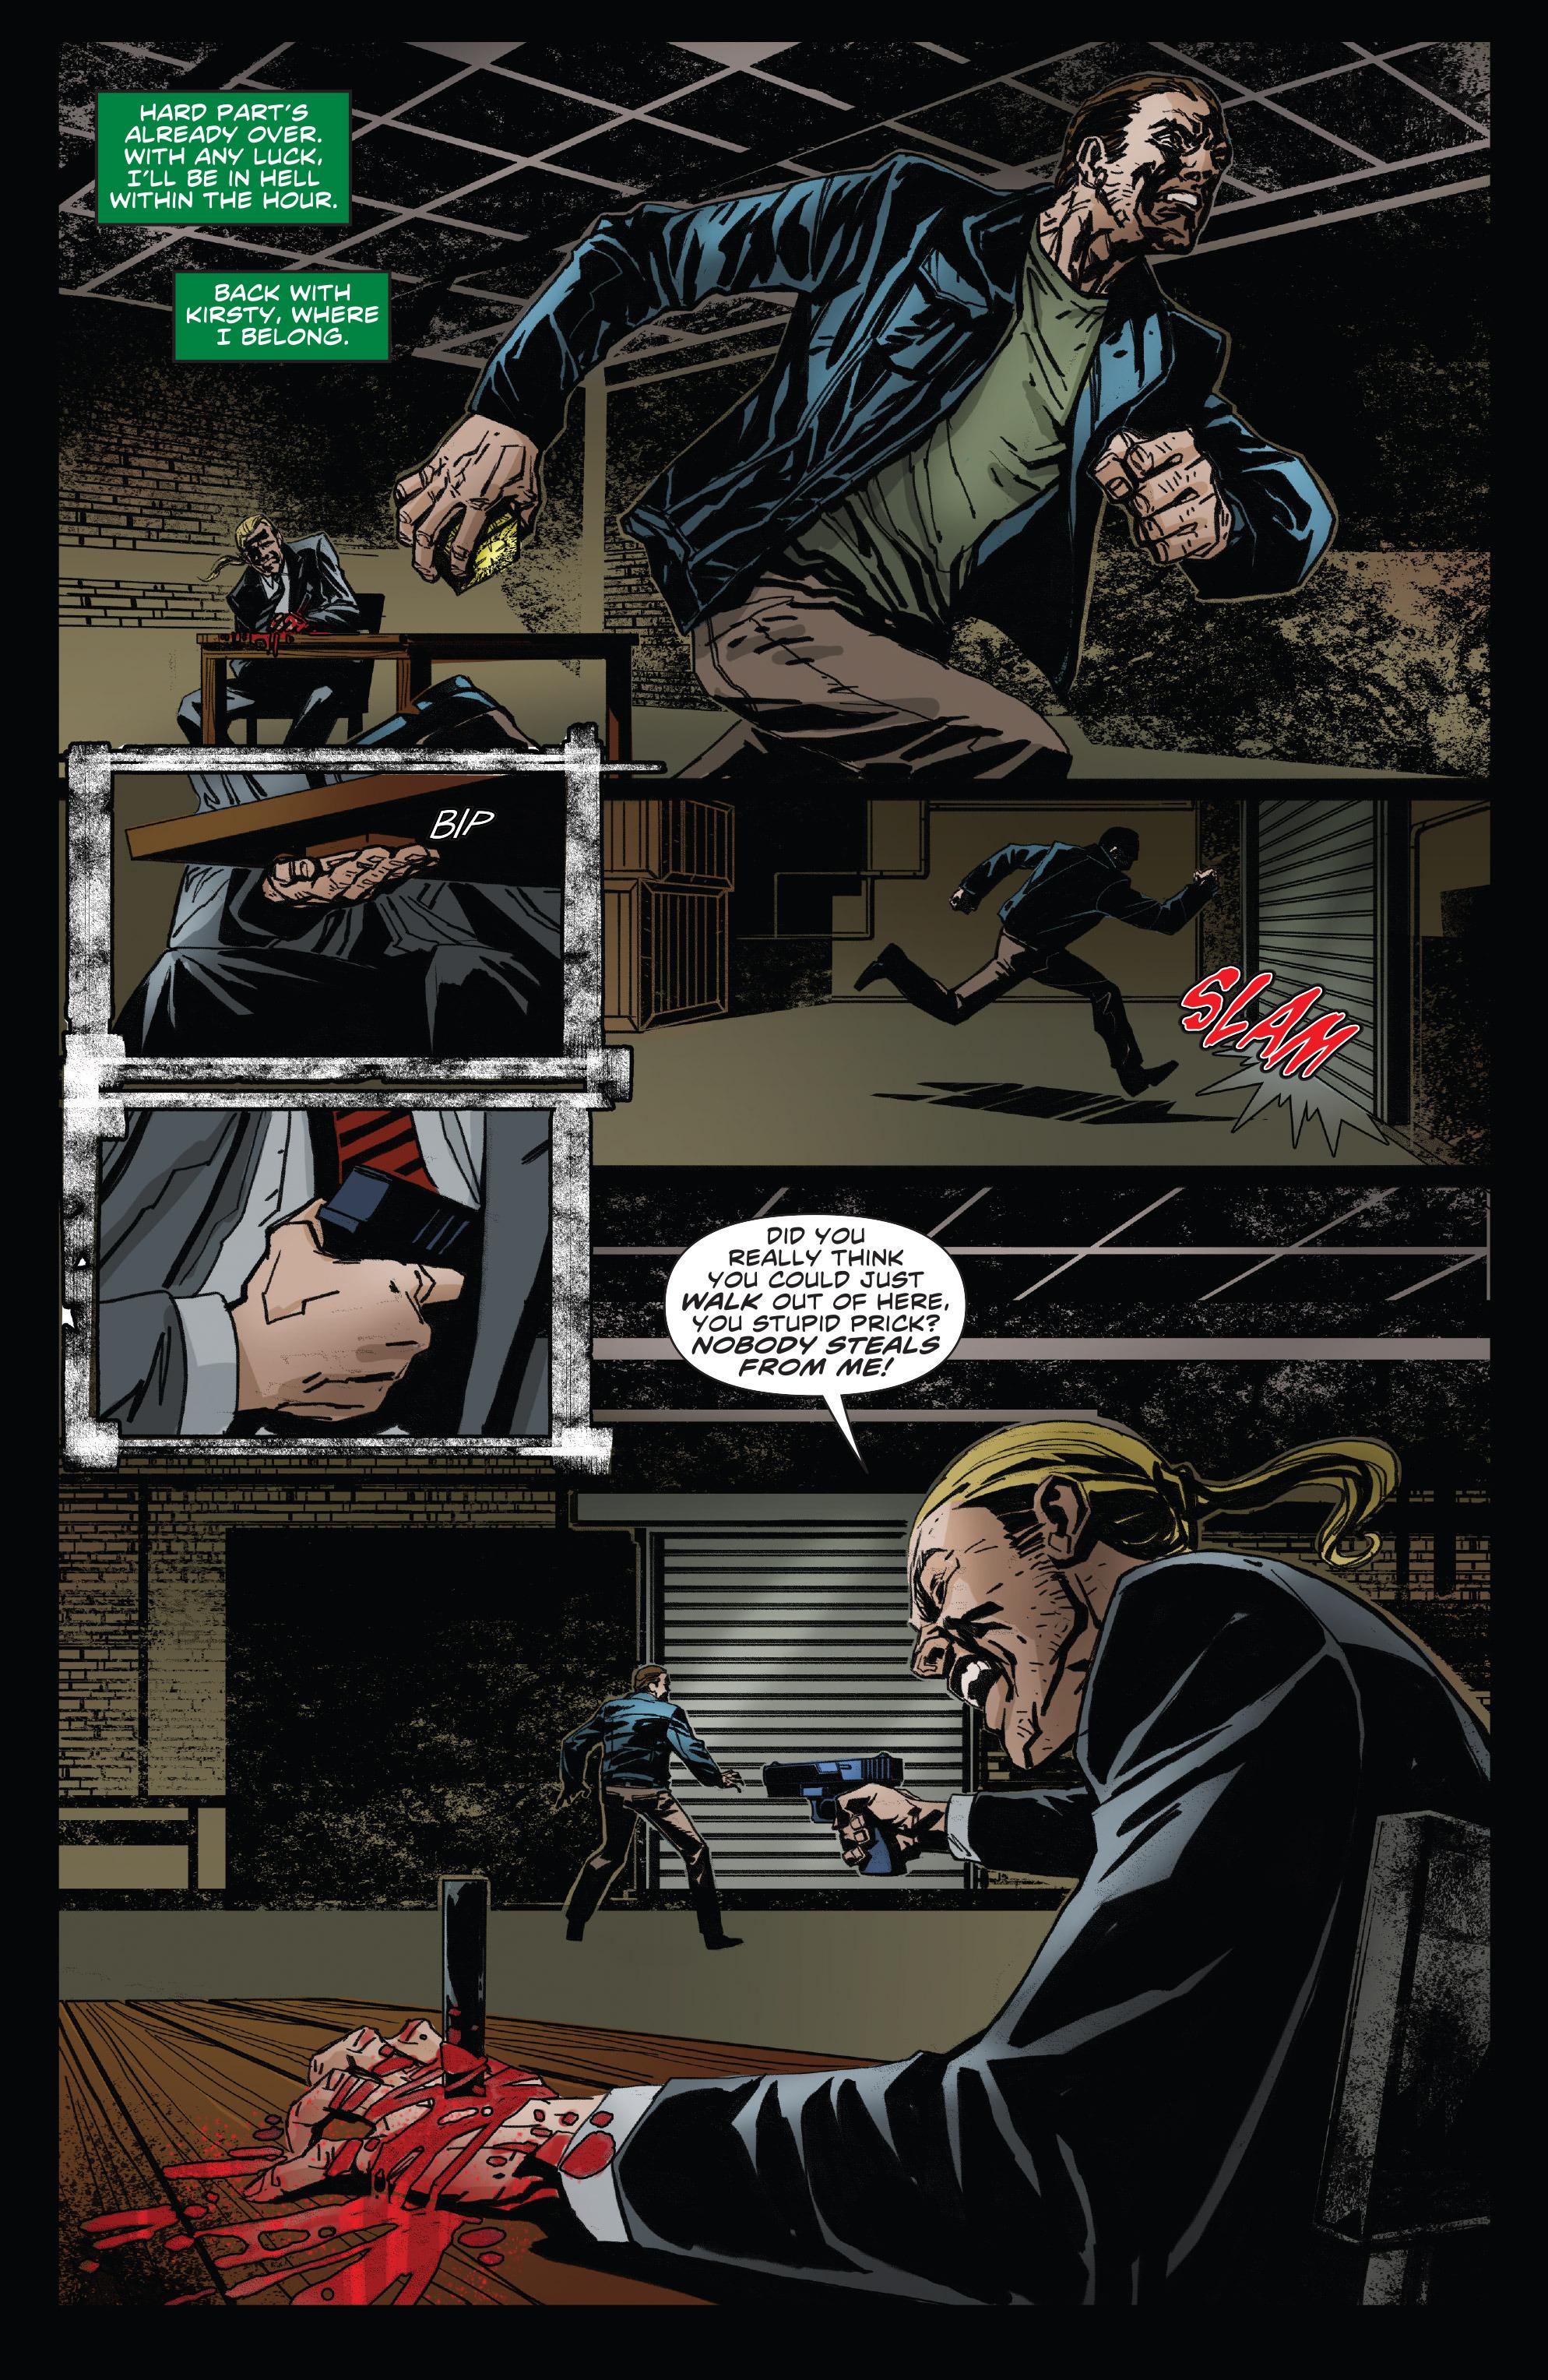 Read online Clive Barker's Hellraiser: The Dark Watch comic -  Issue # TPB 3 - 19